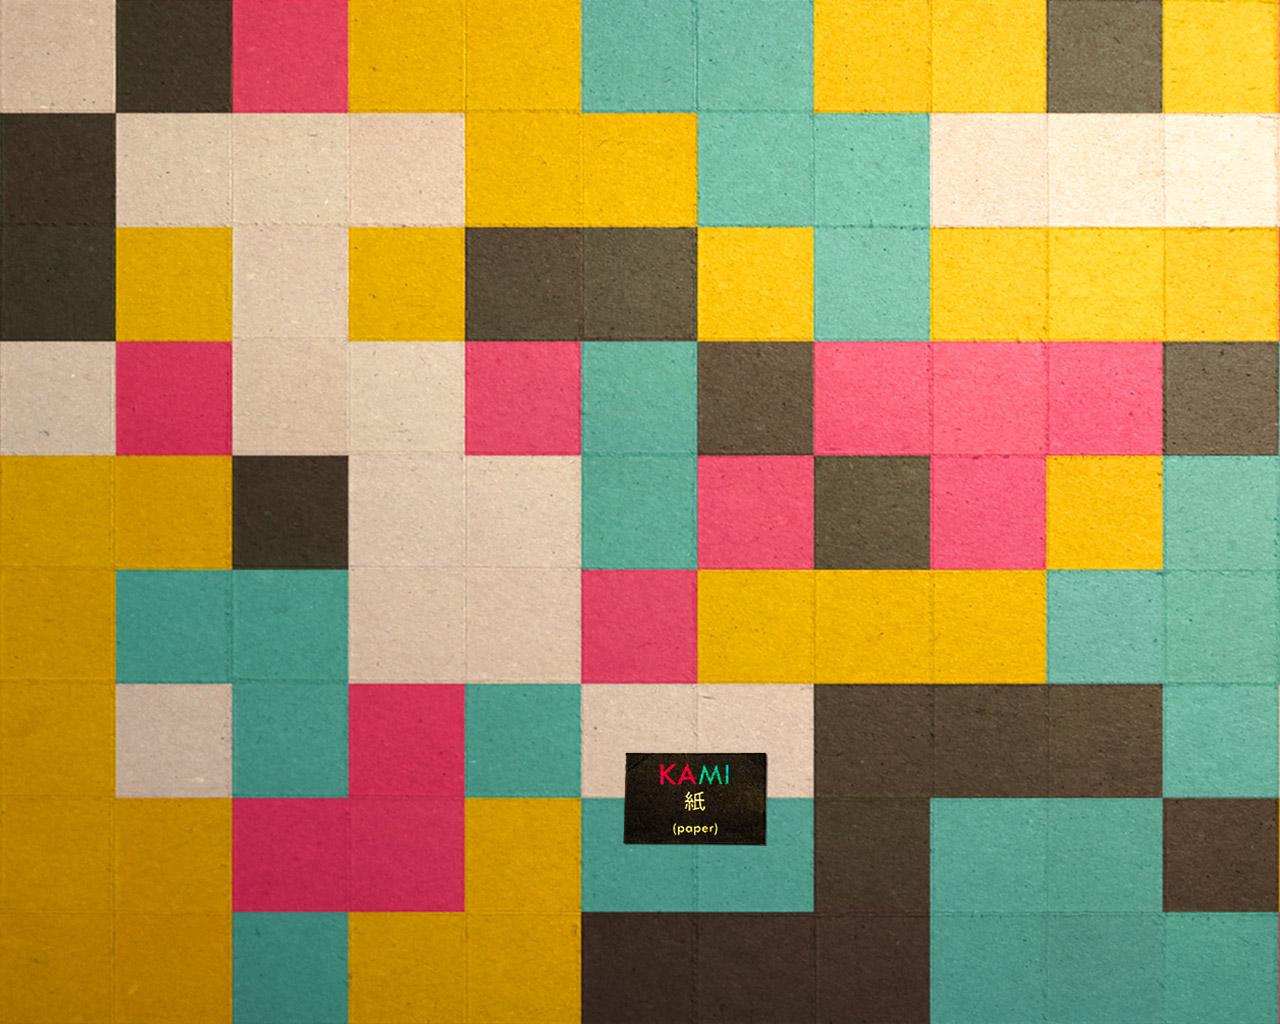 Free Kami Wallpaper in 1280x1024